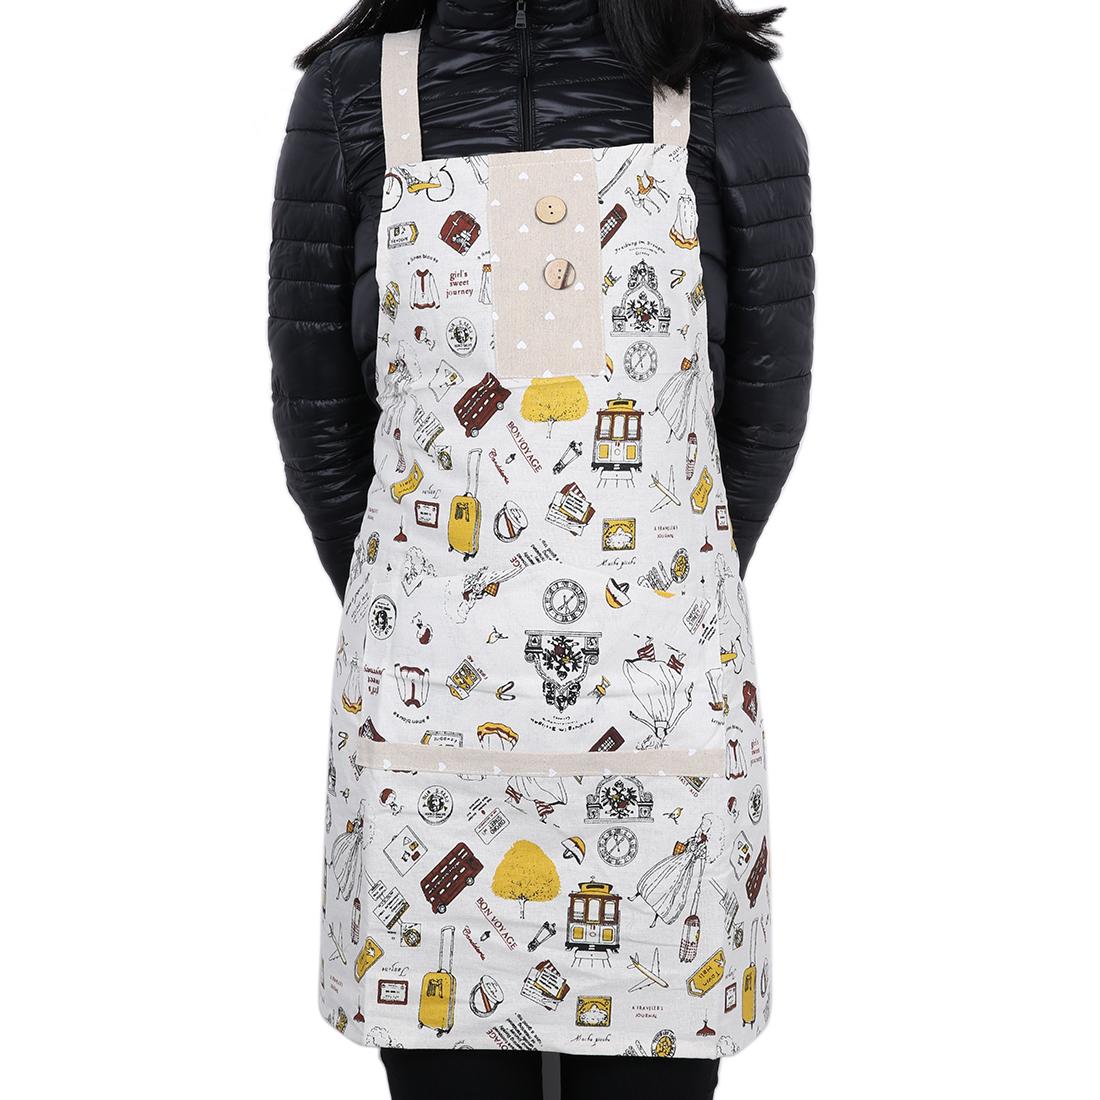 Ladies Woman Kitchen Bib Cooking Catering Apron Dress Apron